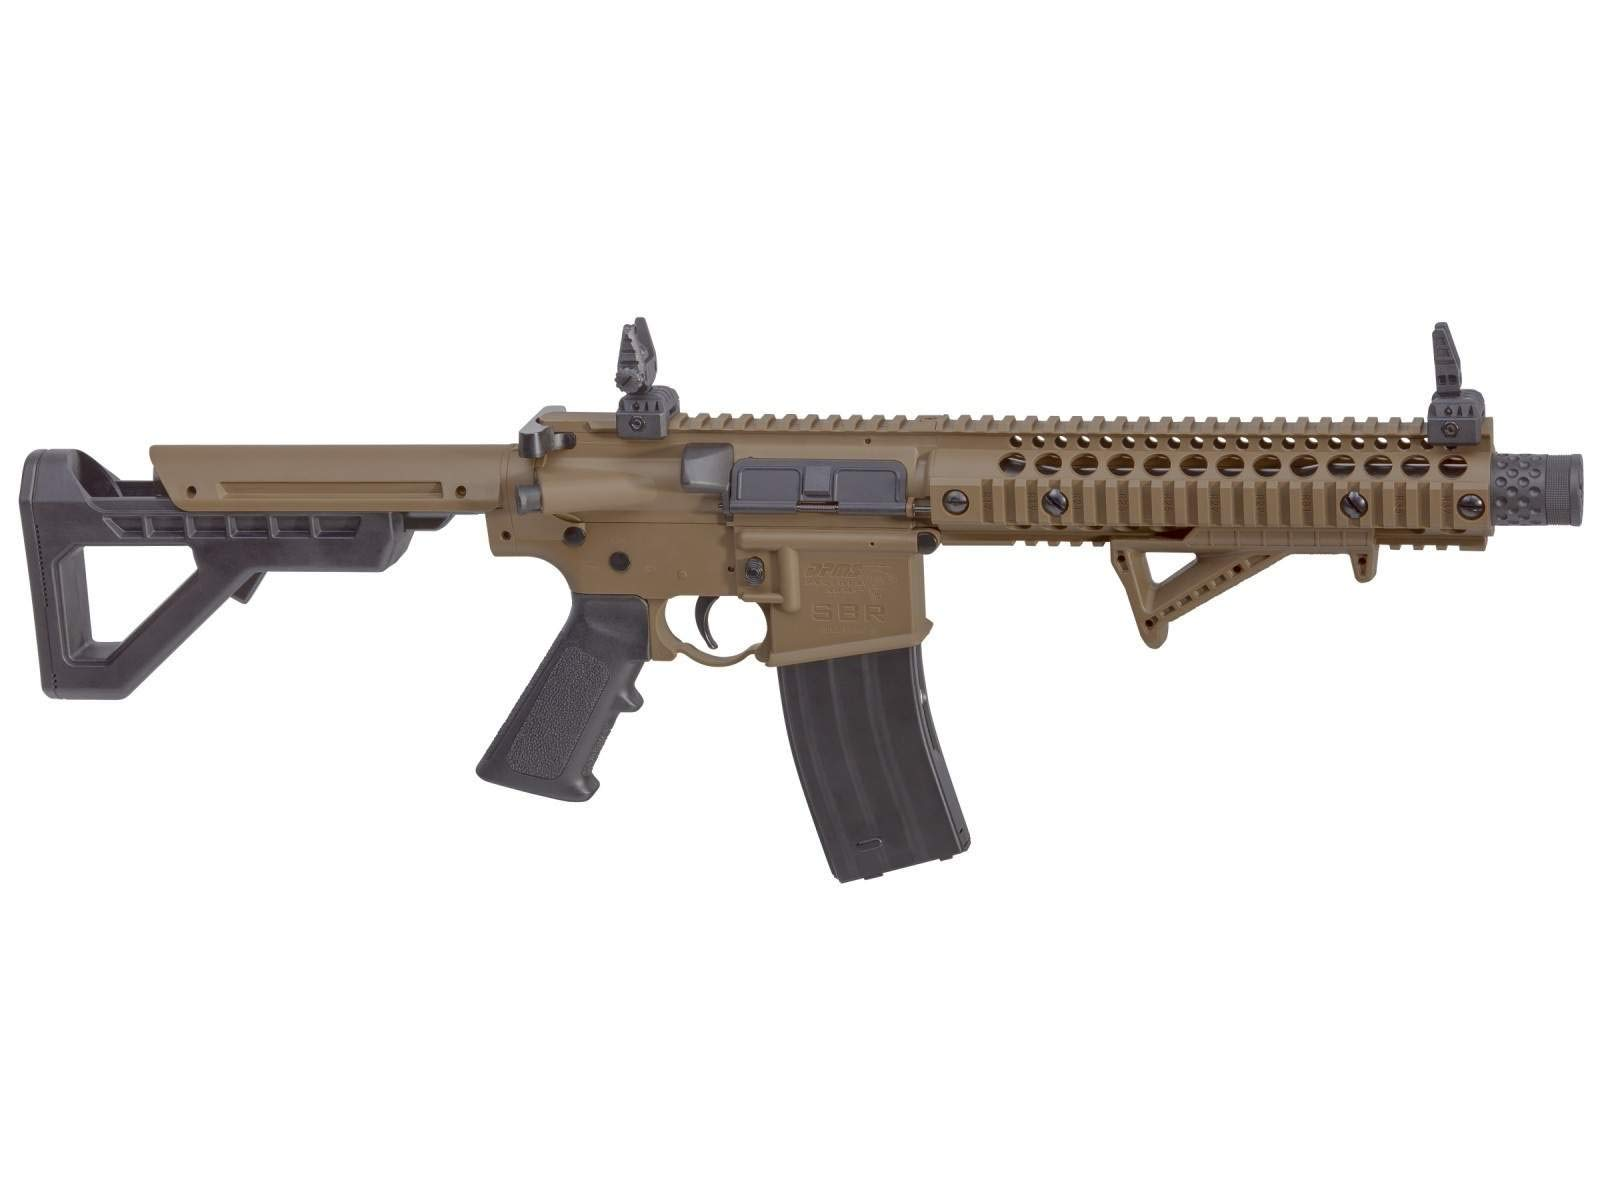 Crosman DPMS SBR Full Auto CO2 Air Rifle, 177 Caliber BB Flat Dark Earth Synthetic Stock(DSBRFDE), Caliber: .177 by Crosman